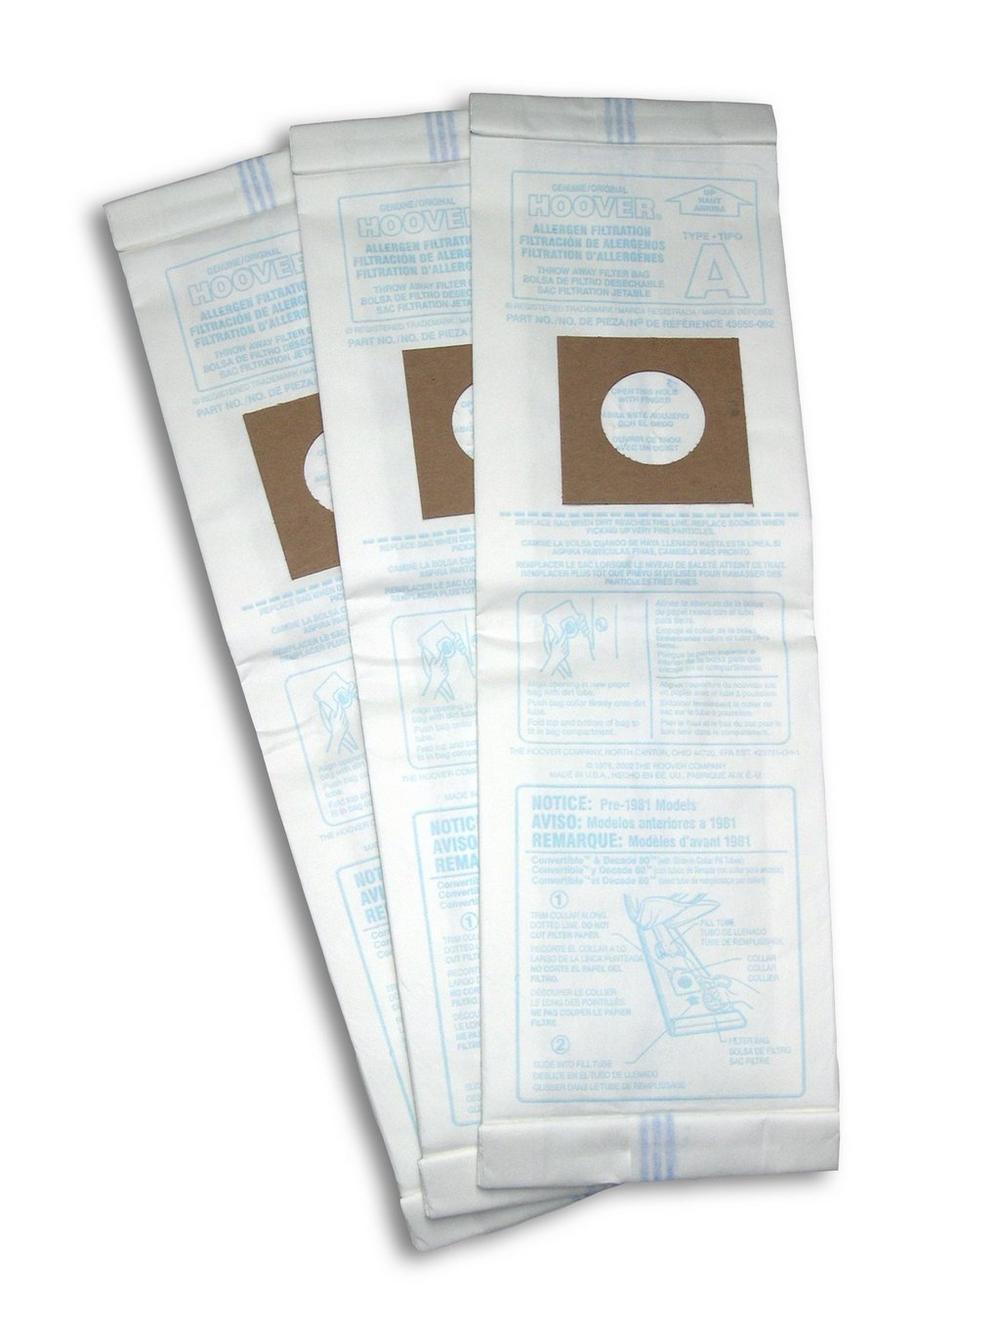 Type A Allergen Bag - 3 Pack7